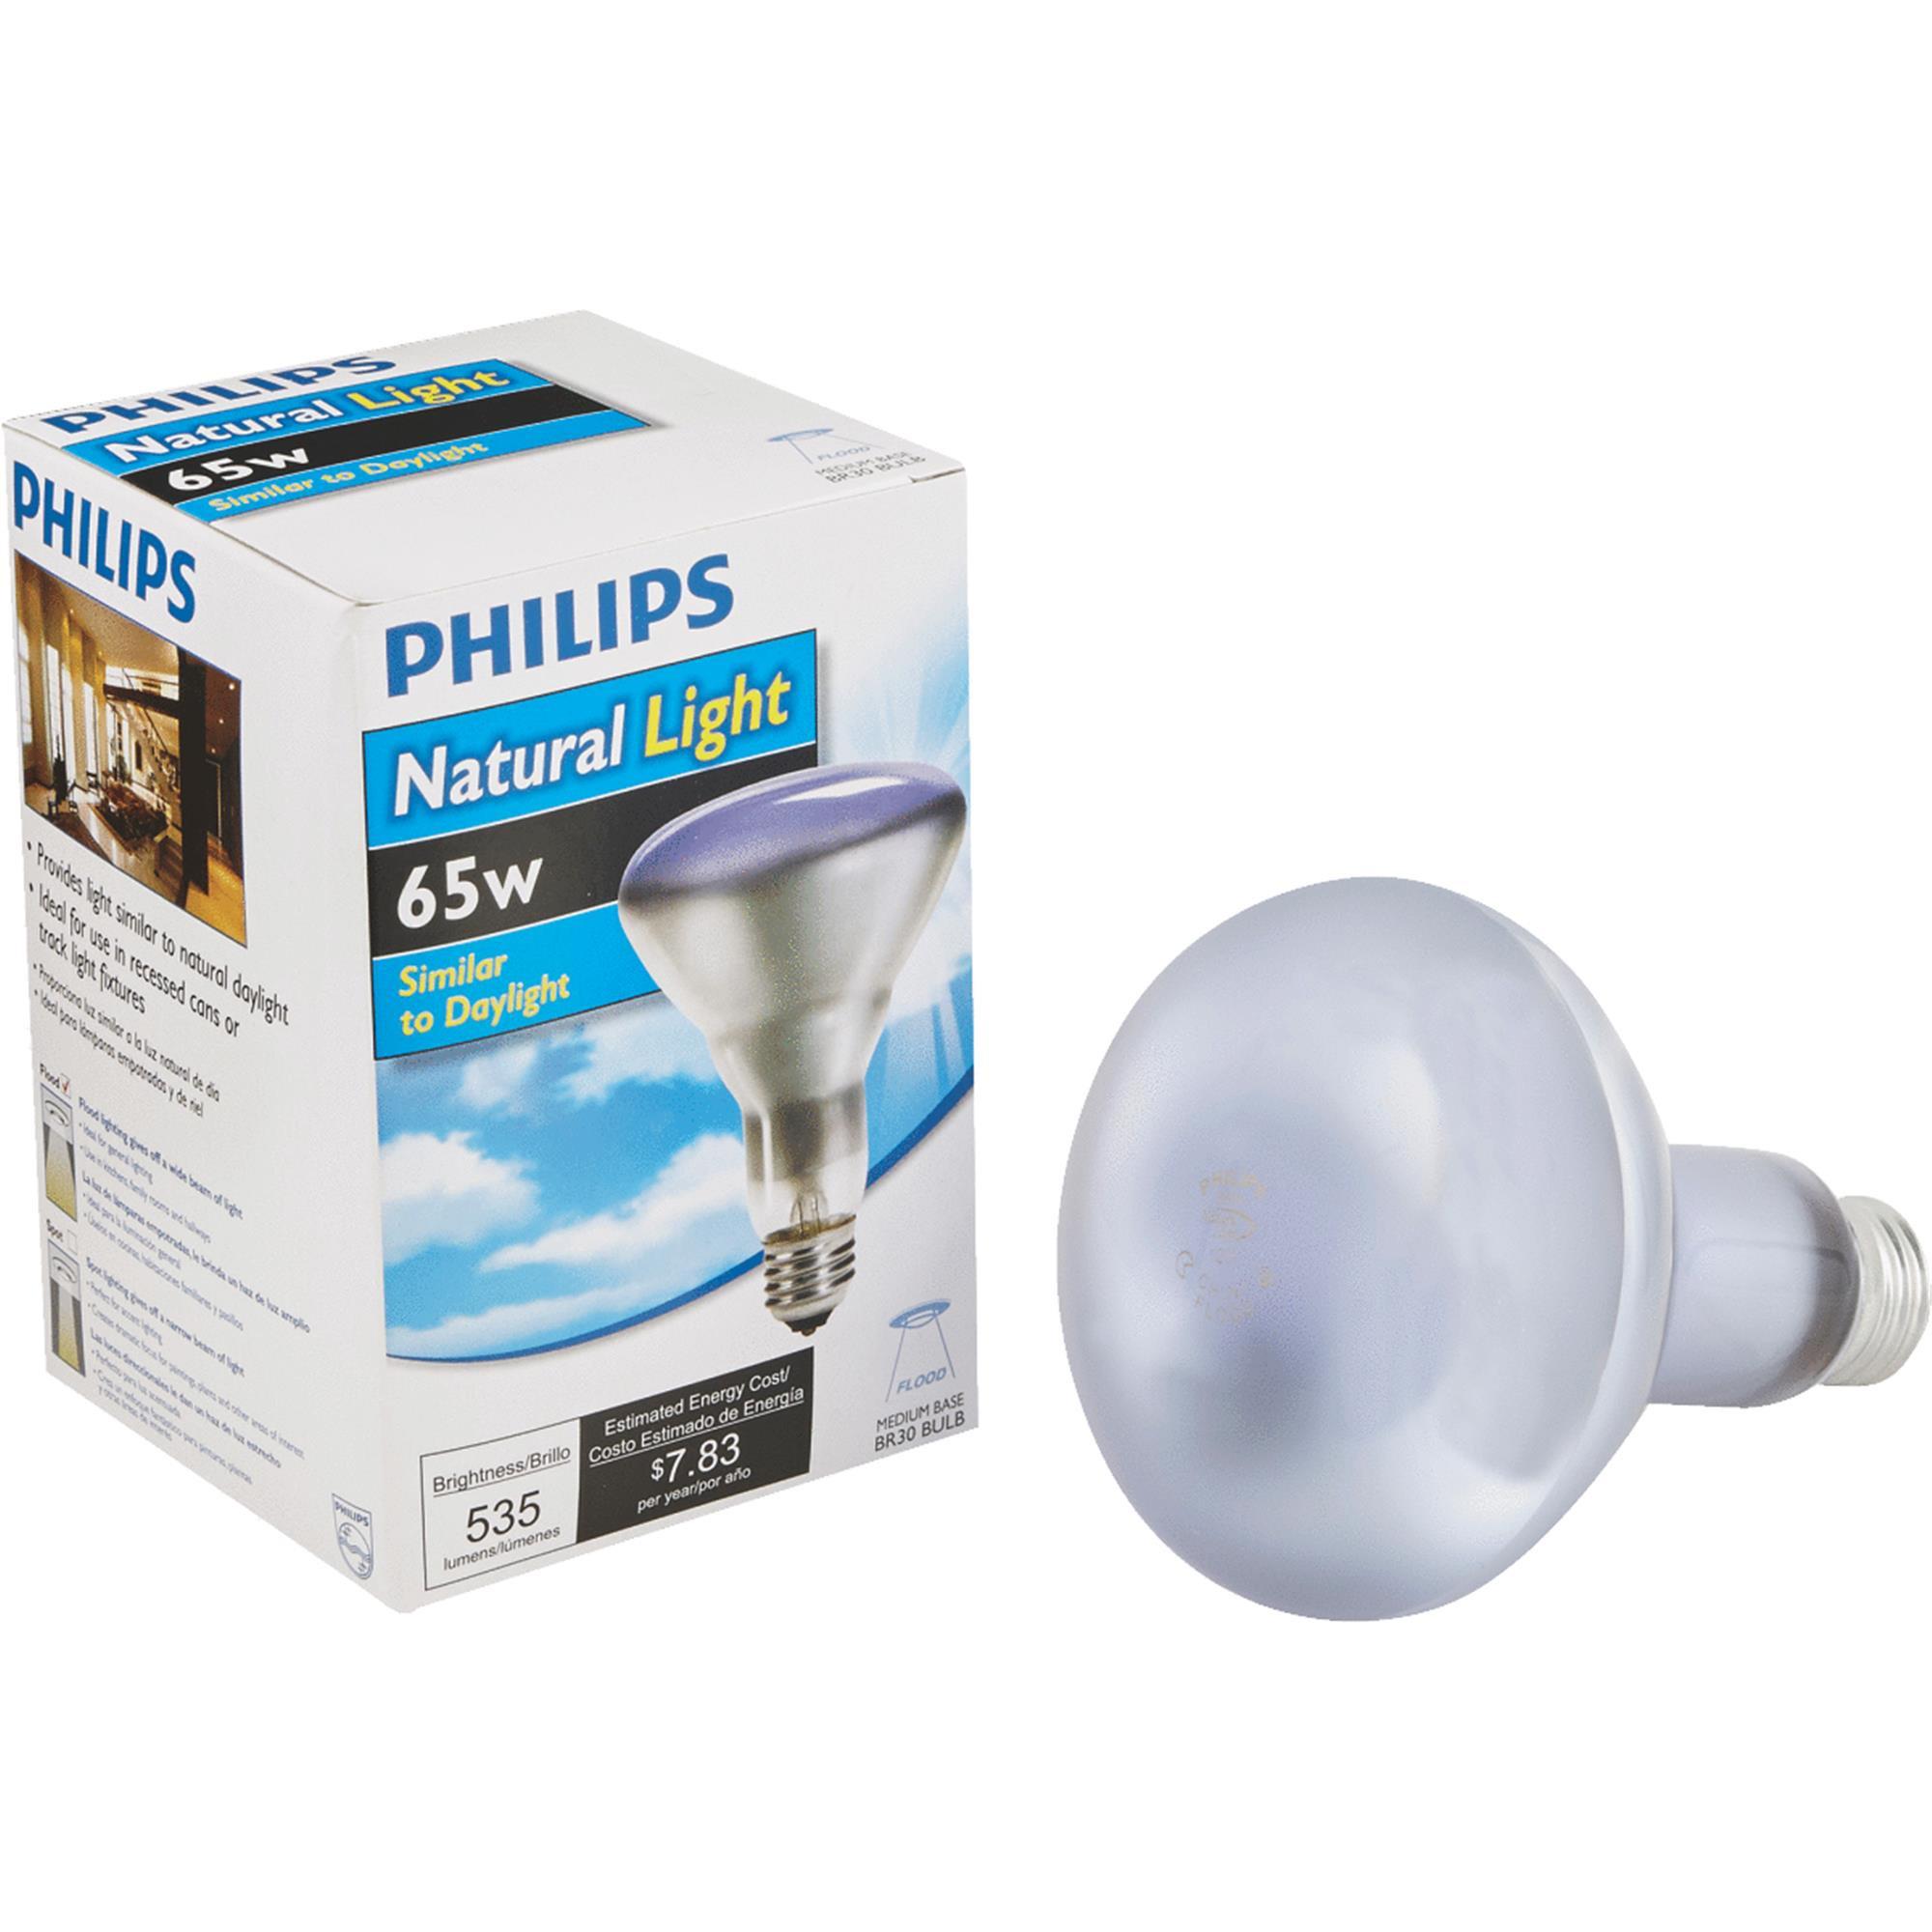 Philips Natural Light BR30 Incandescent Floodlight Light Bulb